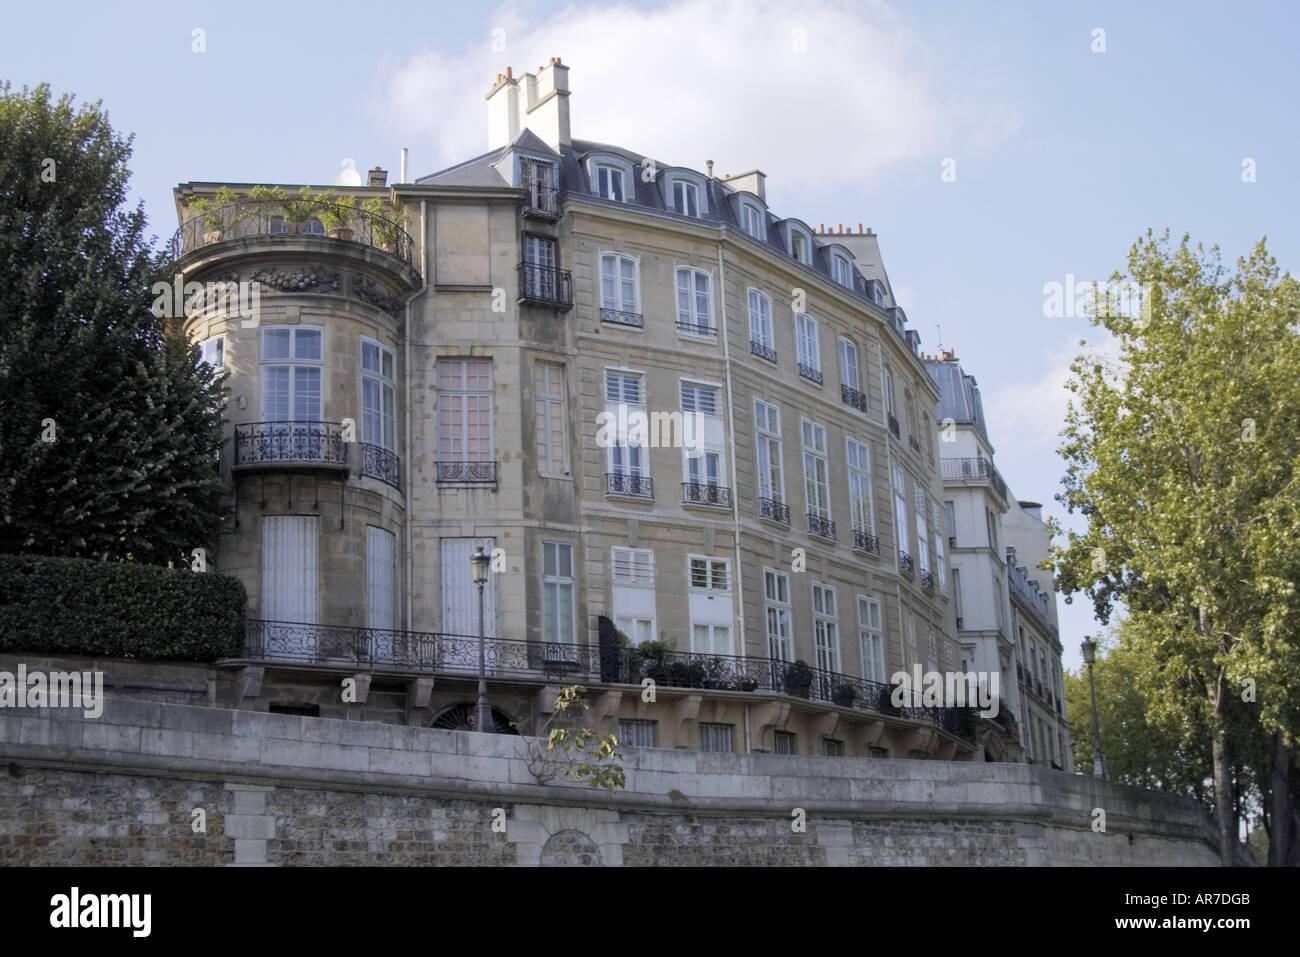 Hotel Lambert 17th century mansion building on Quai d Anjou on Isle de Saint Louis and islend on the River Seine Paris - Stock Image